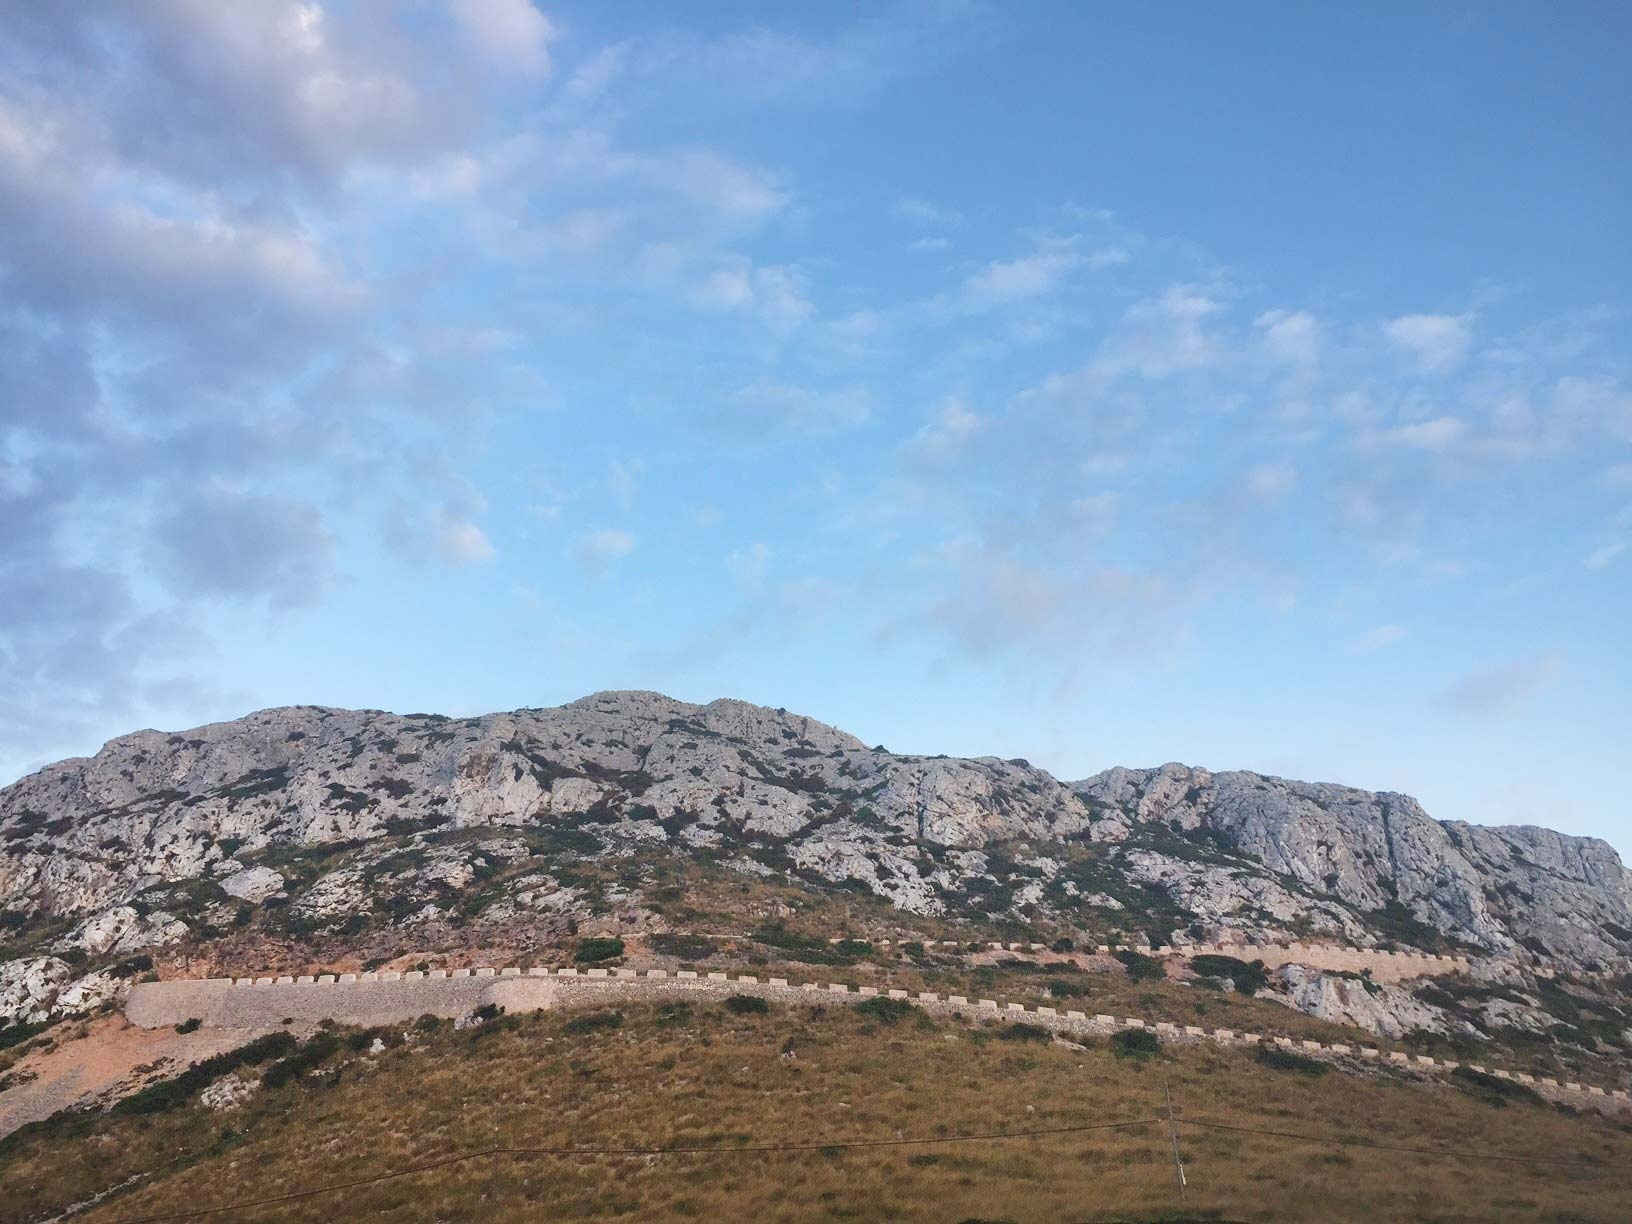 The headland of Mirador Del Mal Pas where the sea roars below